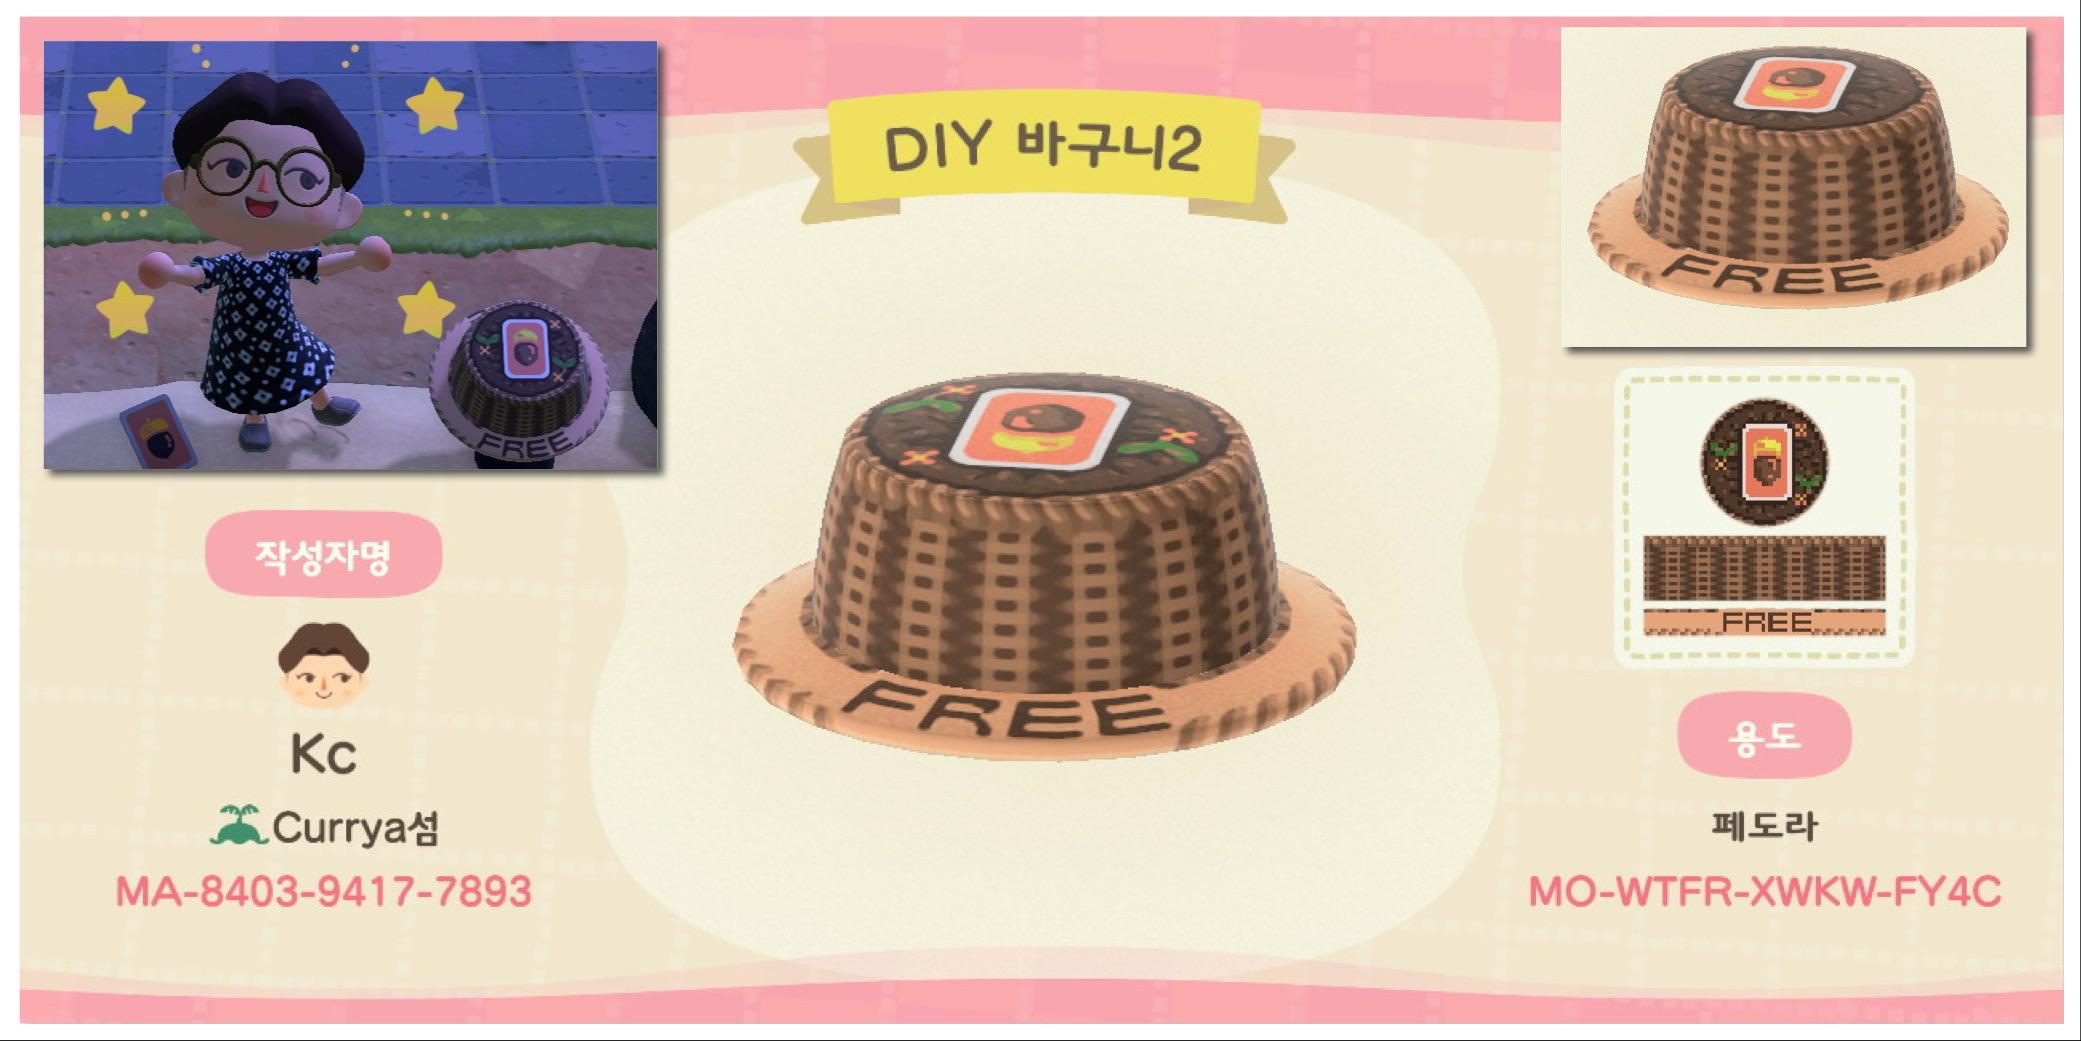 Free DIY Basket v.2